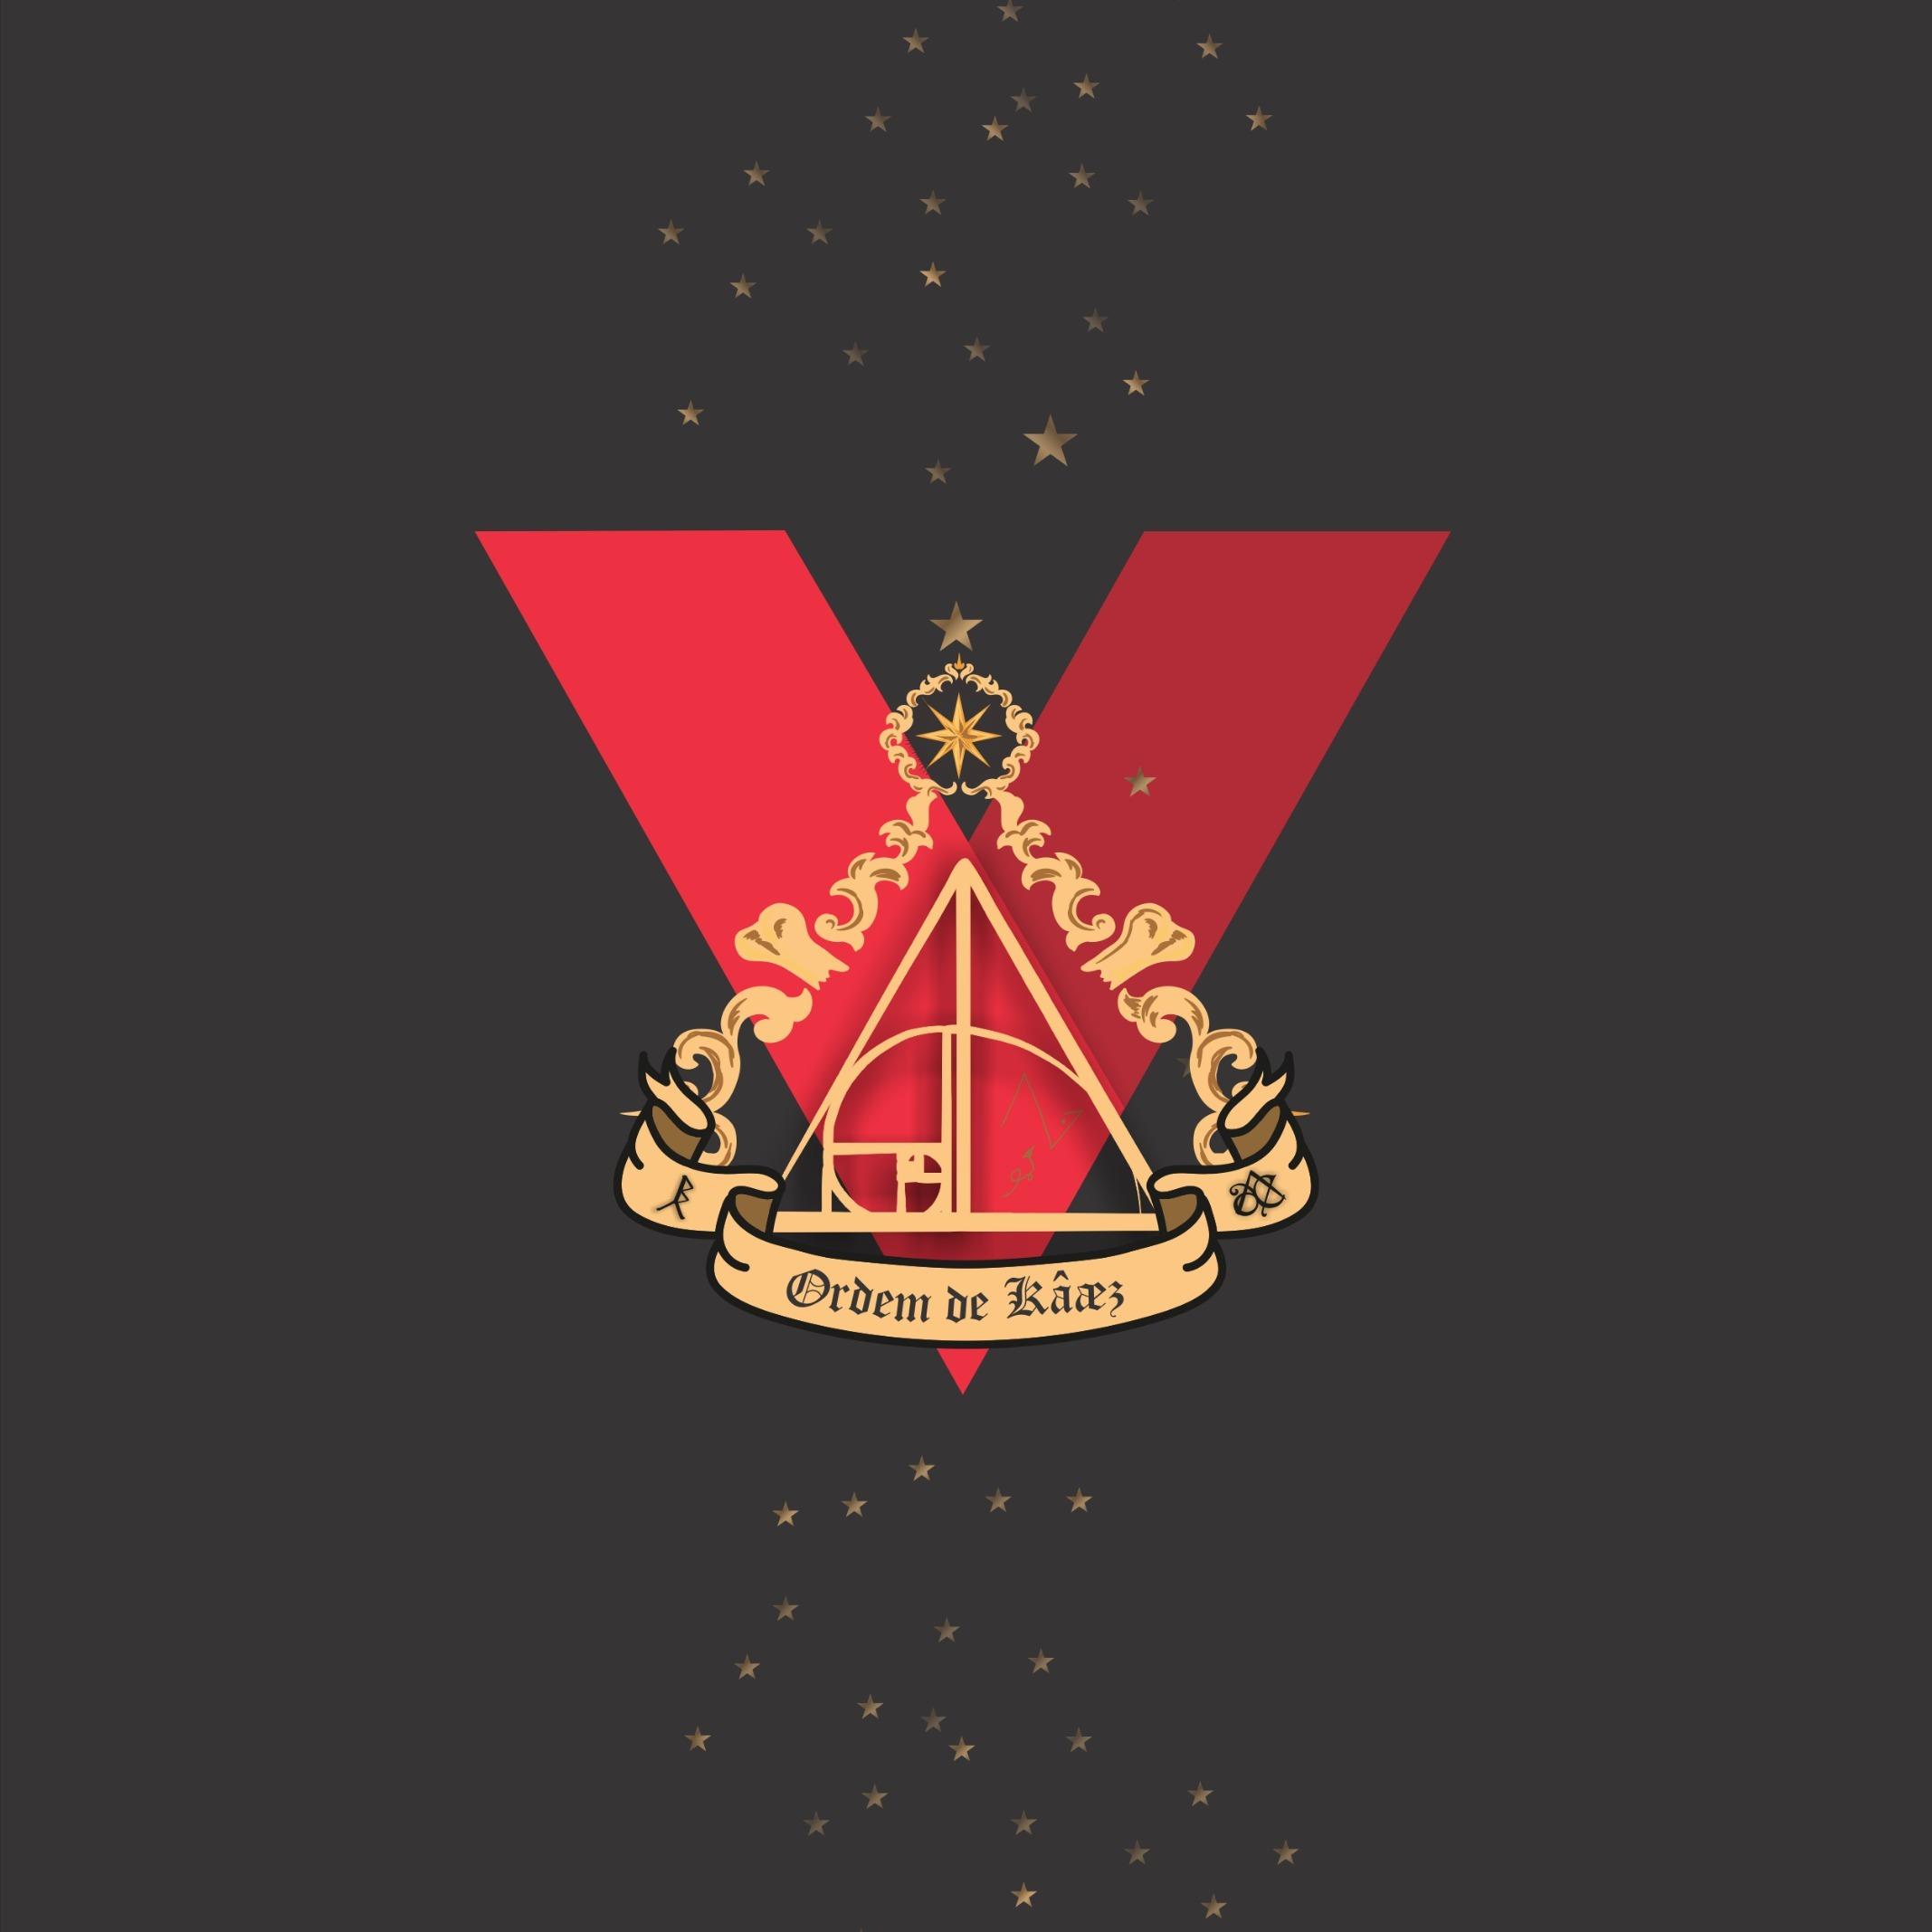 O conceito de Vërtvs